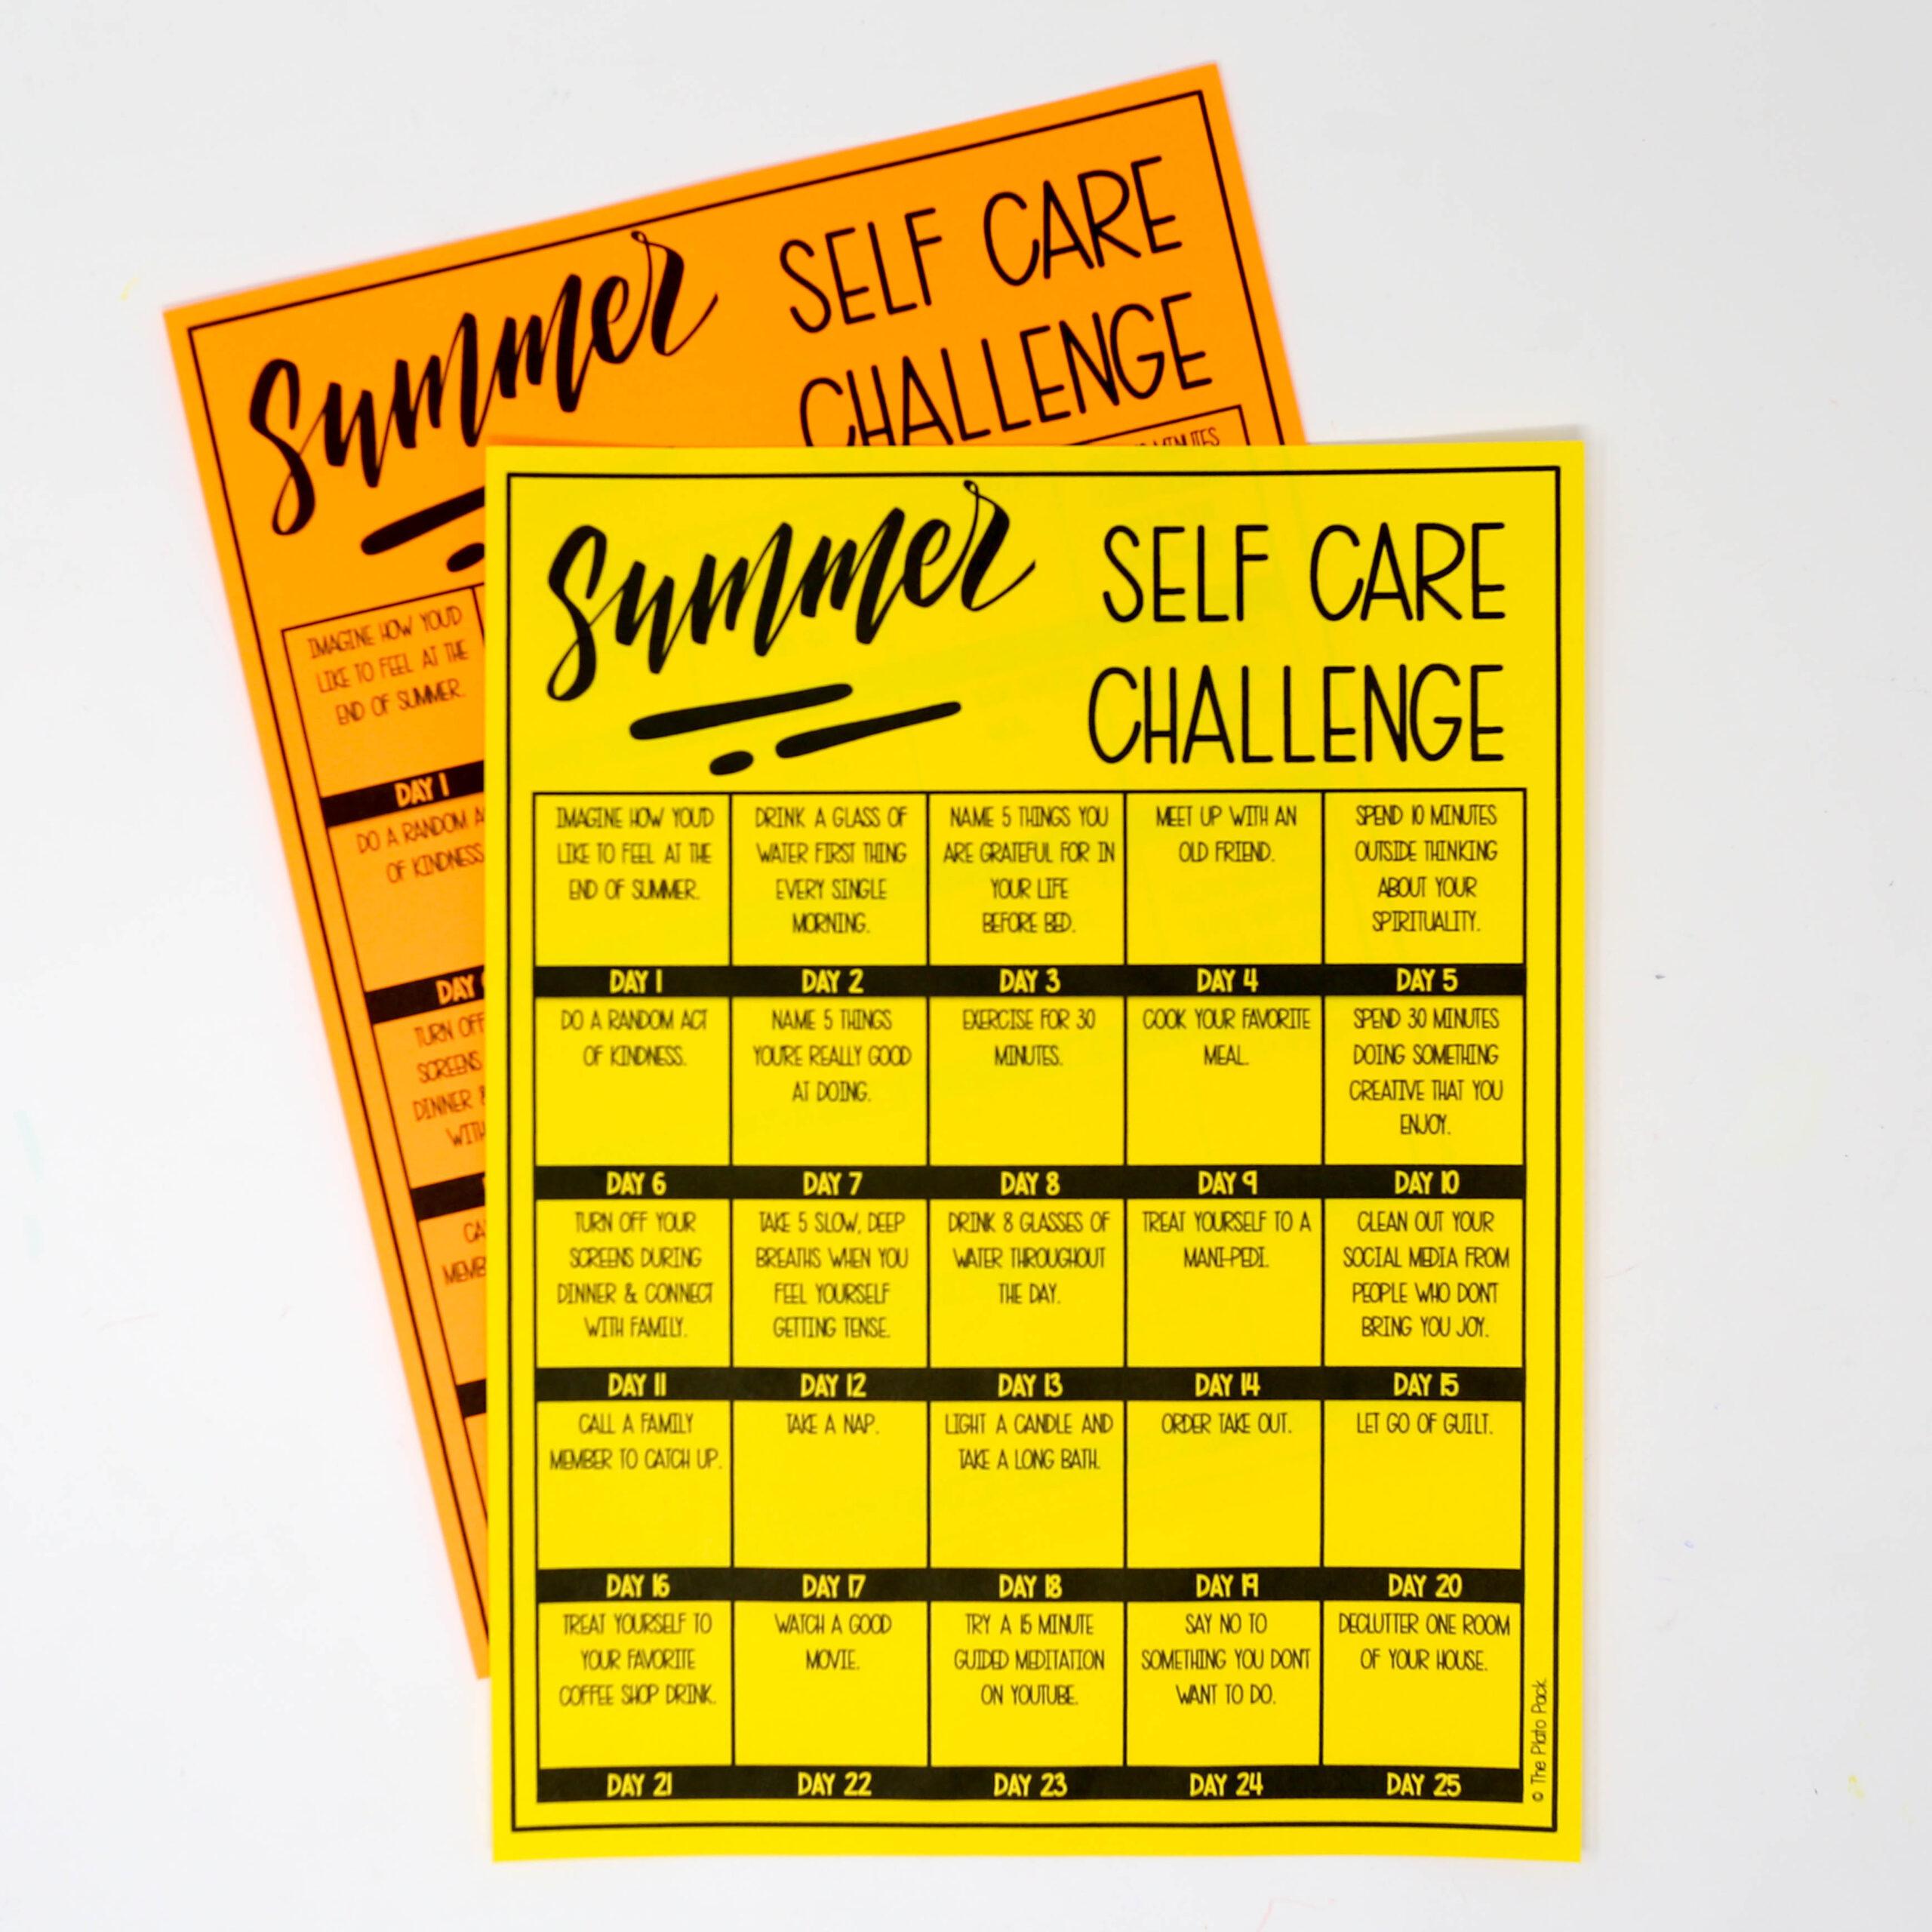 Summer Self Care Challenge